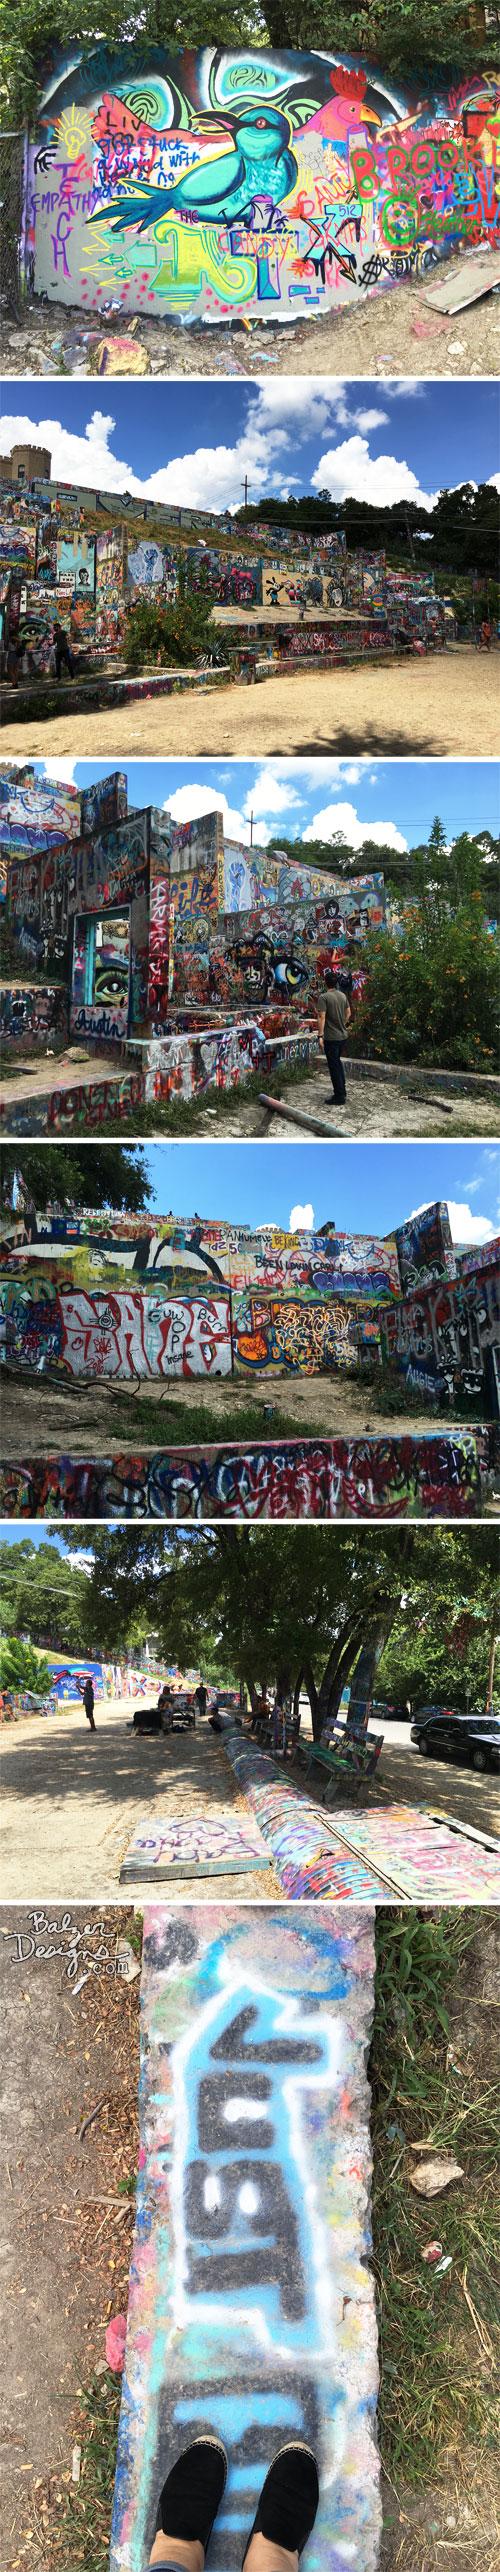 From the Balzer Designs Blog: Art in Austin